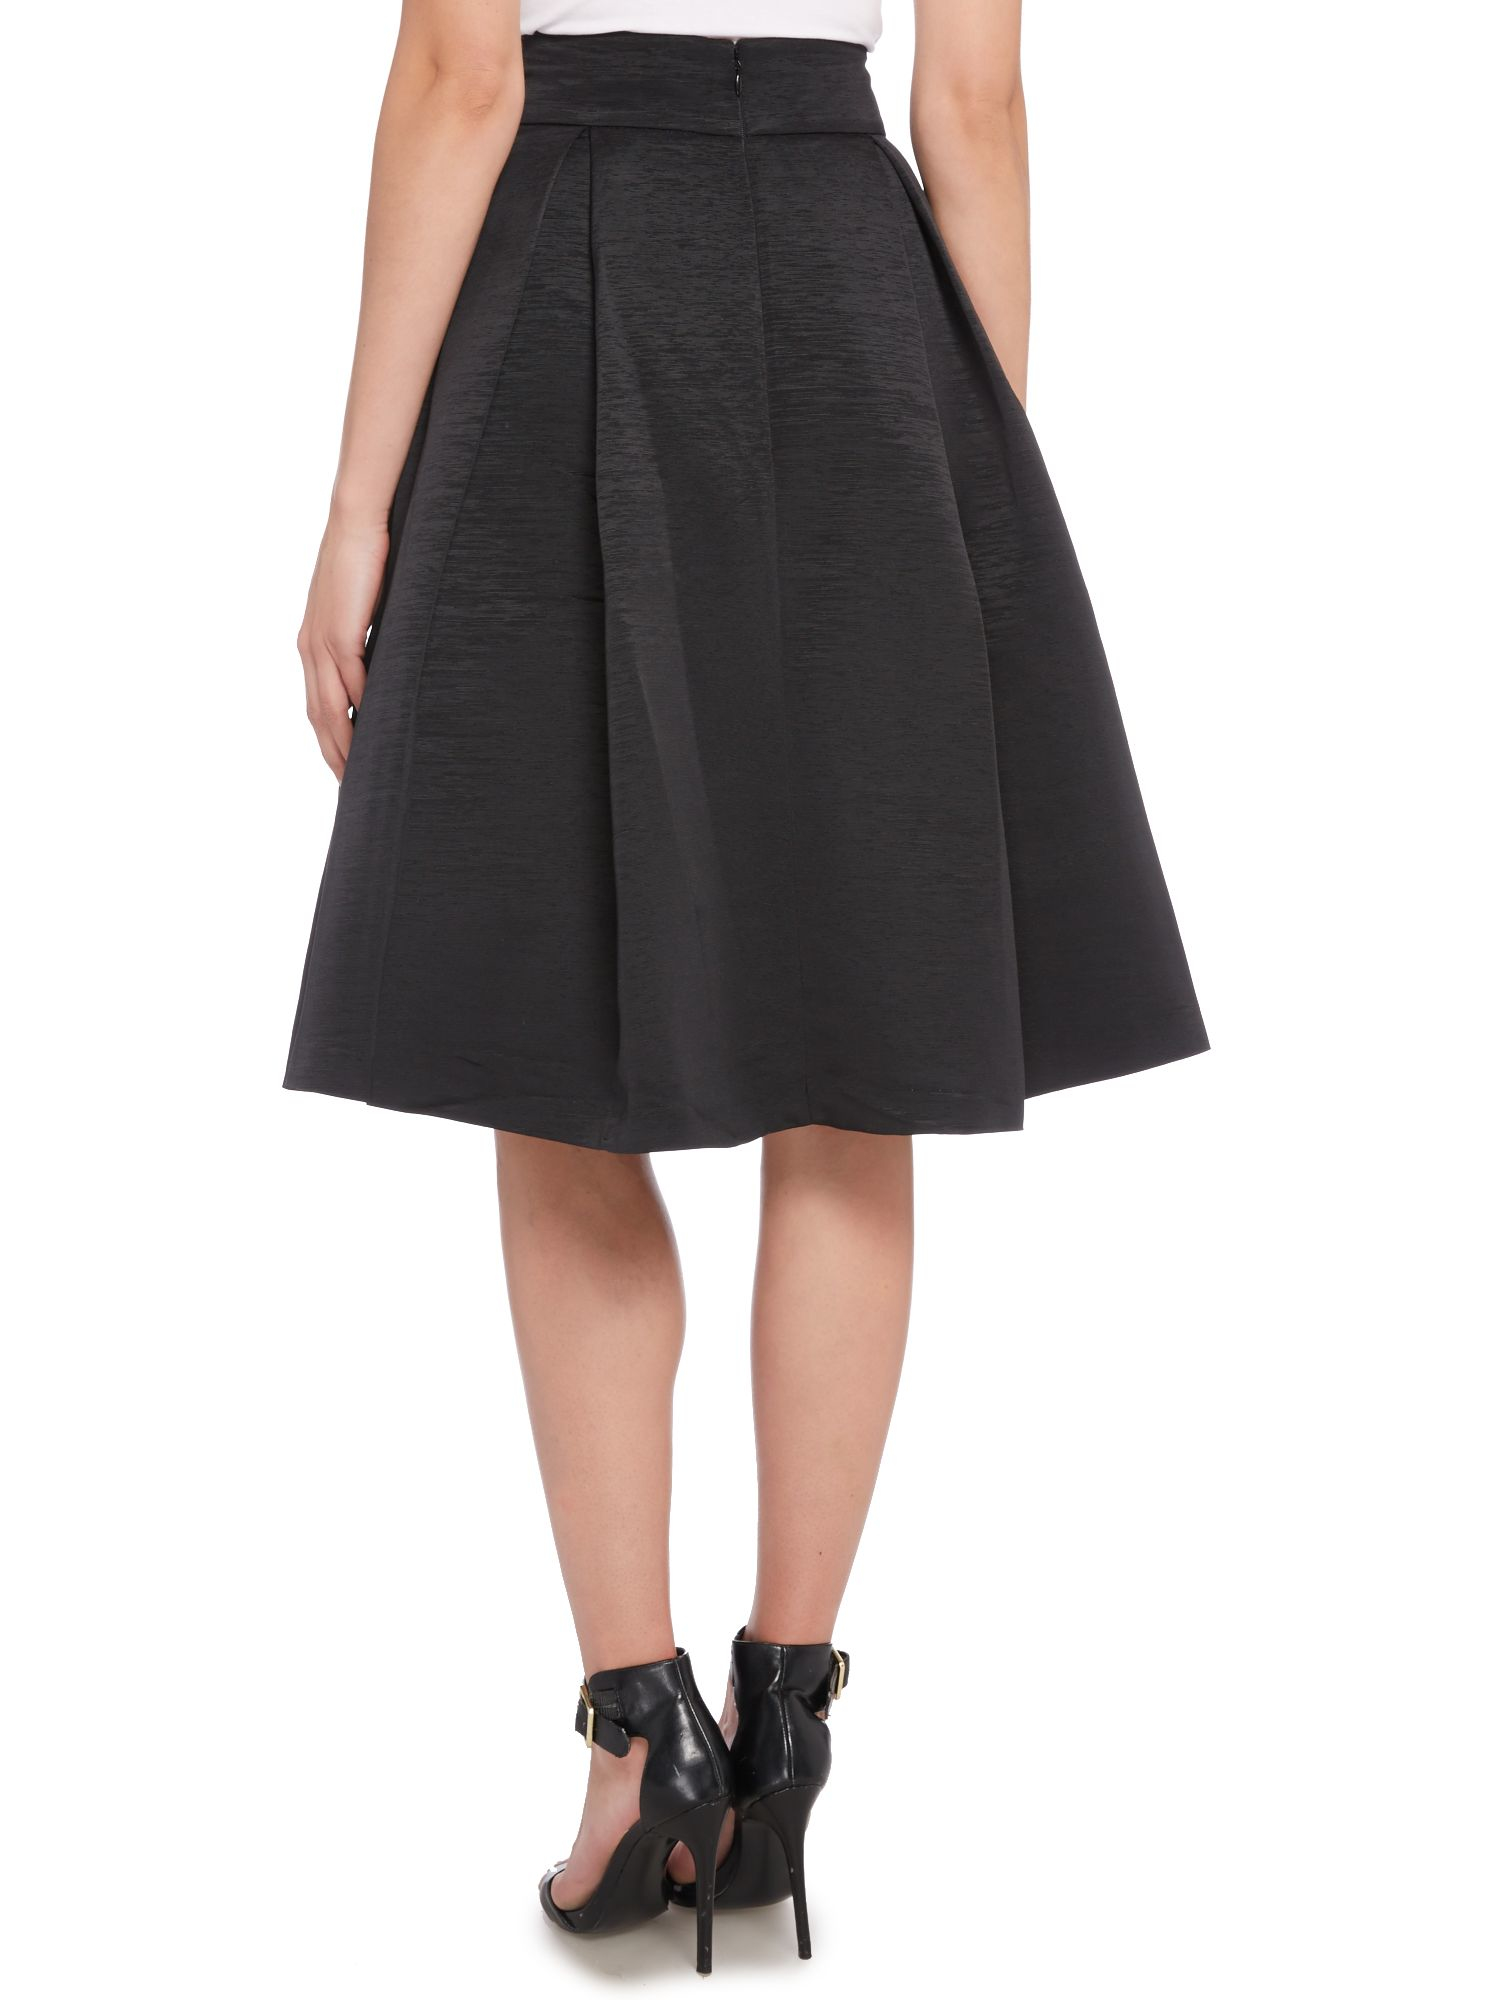 Black pleated school skirt fashion 94